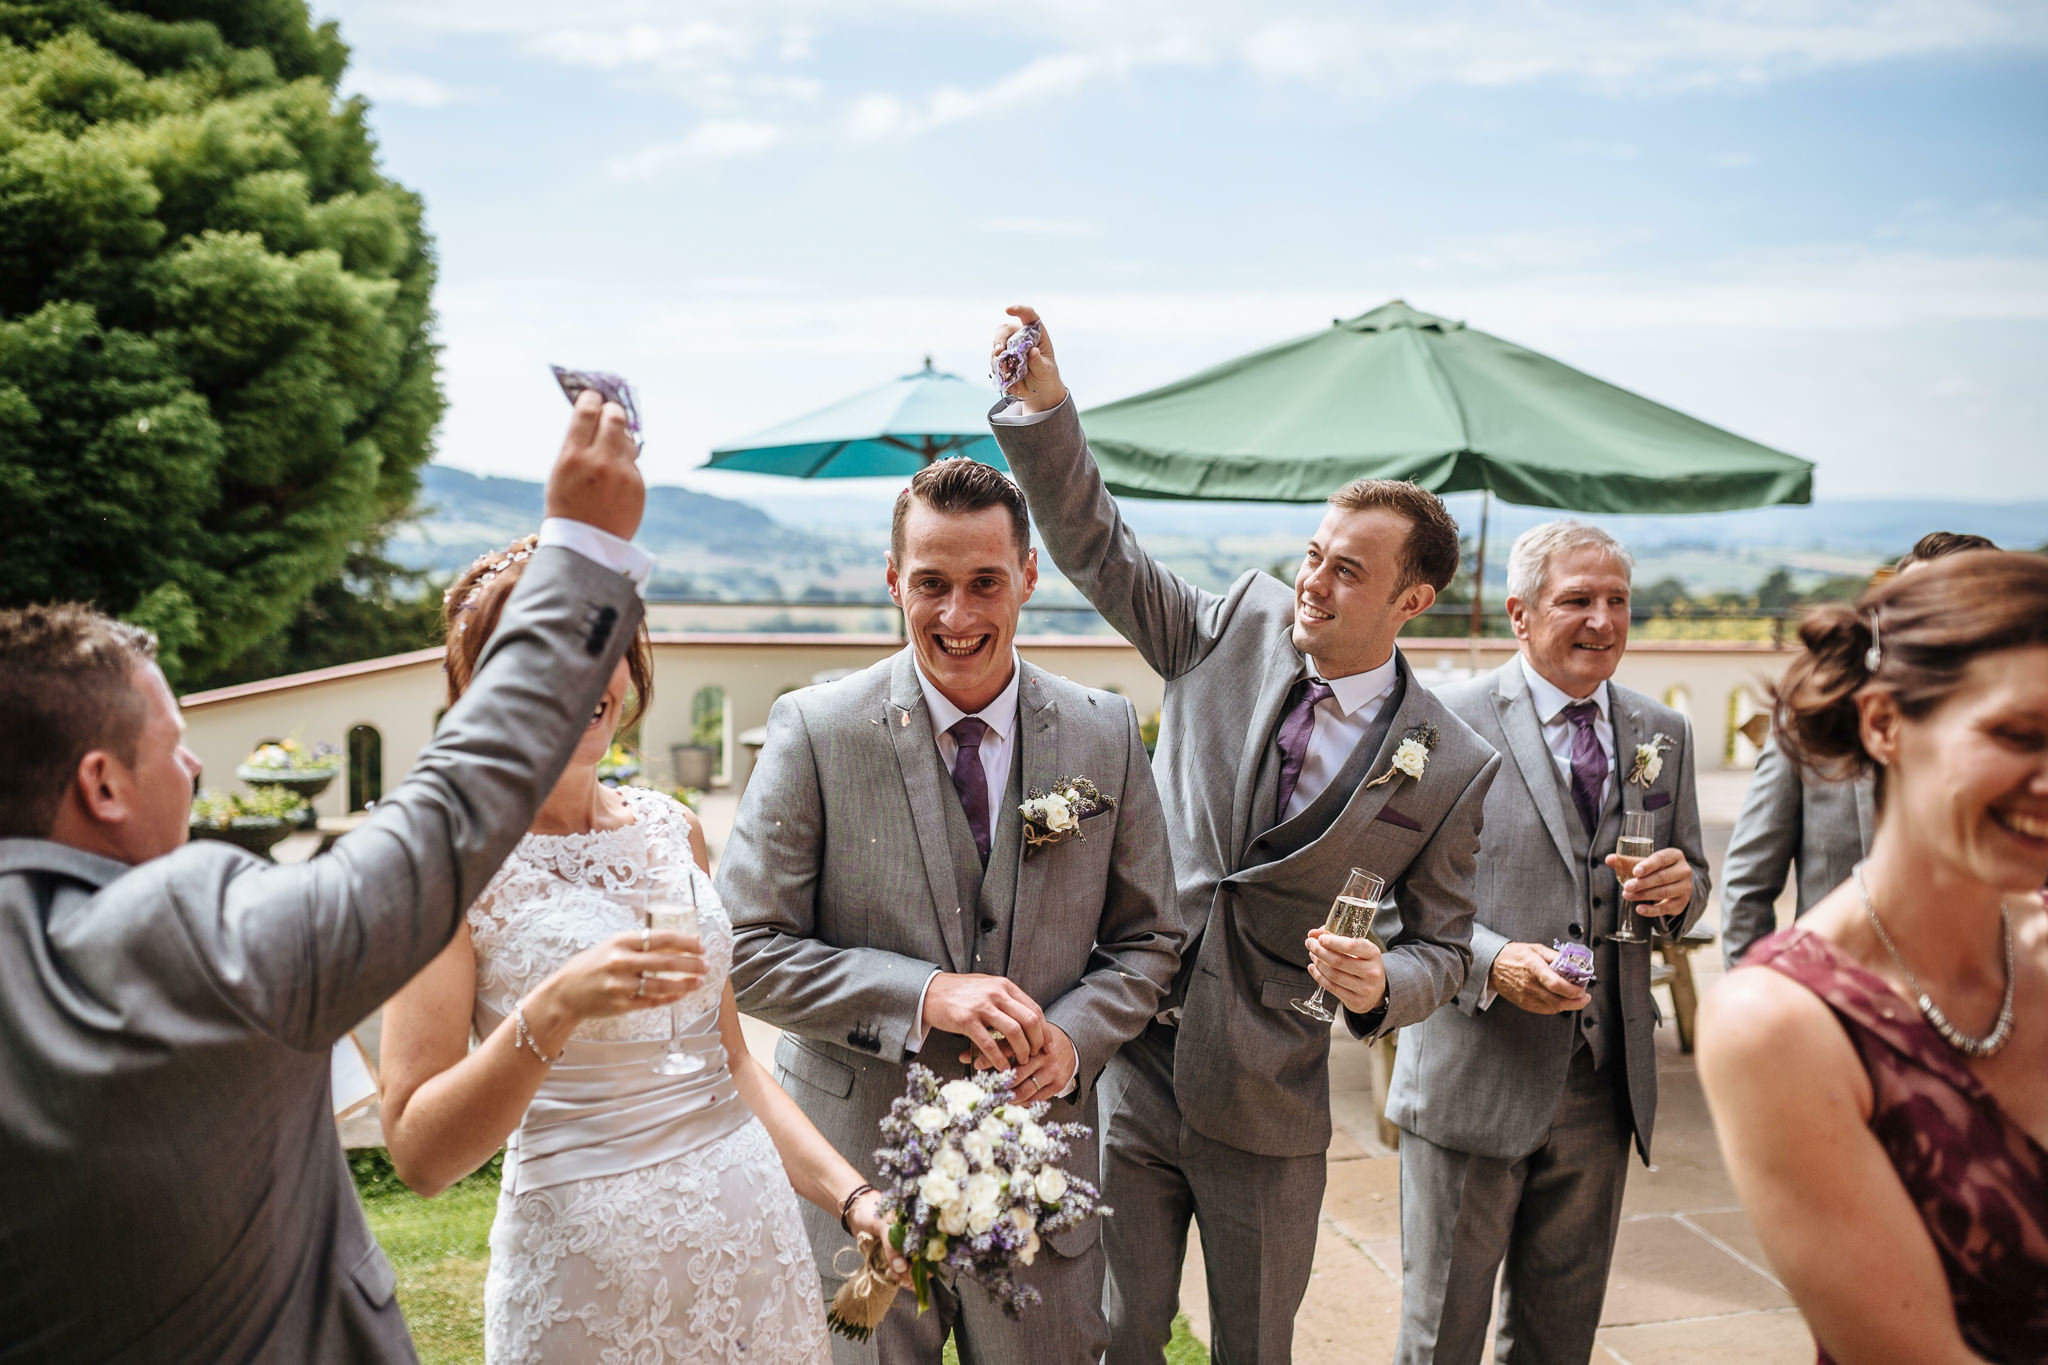 paul-marbrook-Caer-Llan-Wedding-Photographer-90050